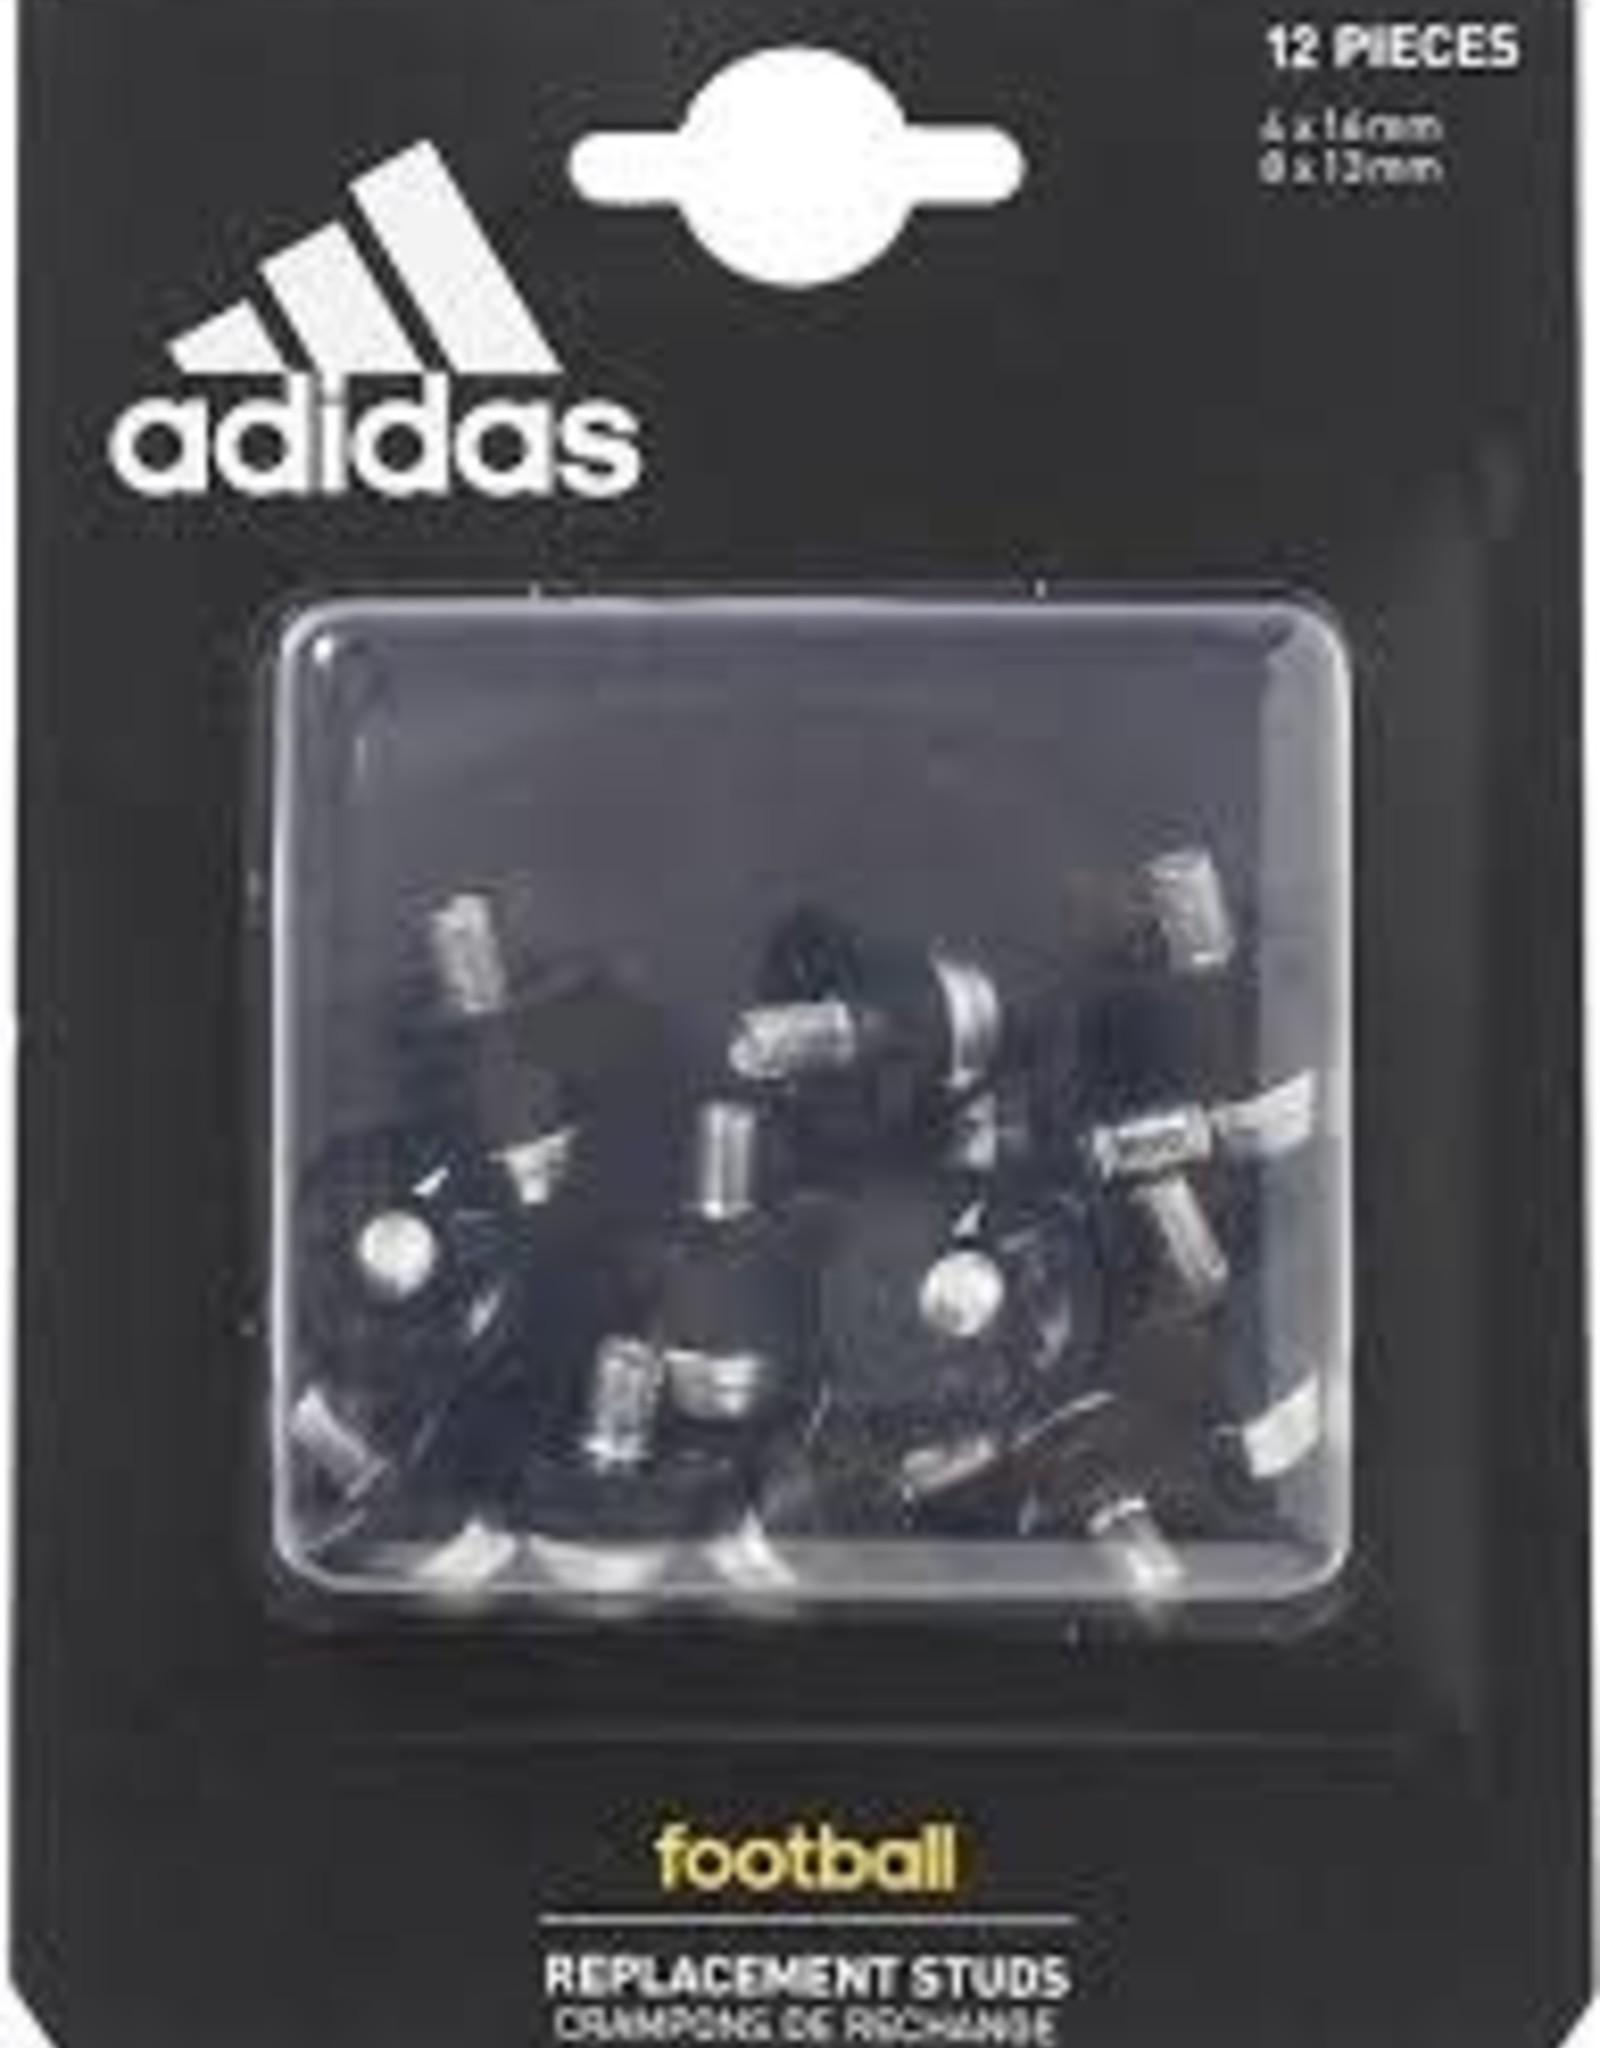 Adidas Adidas Replacement studs